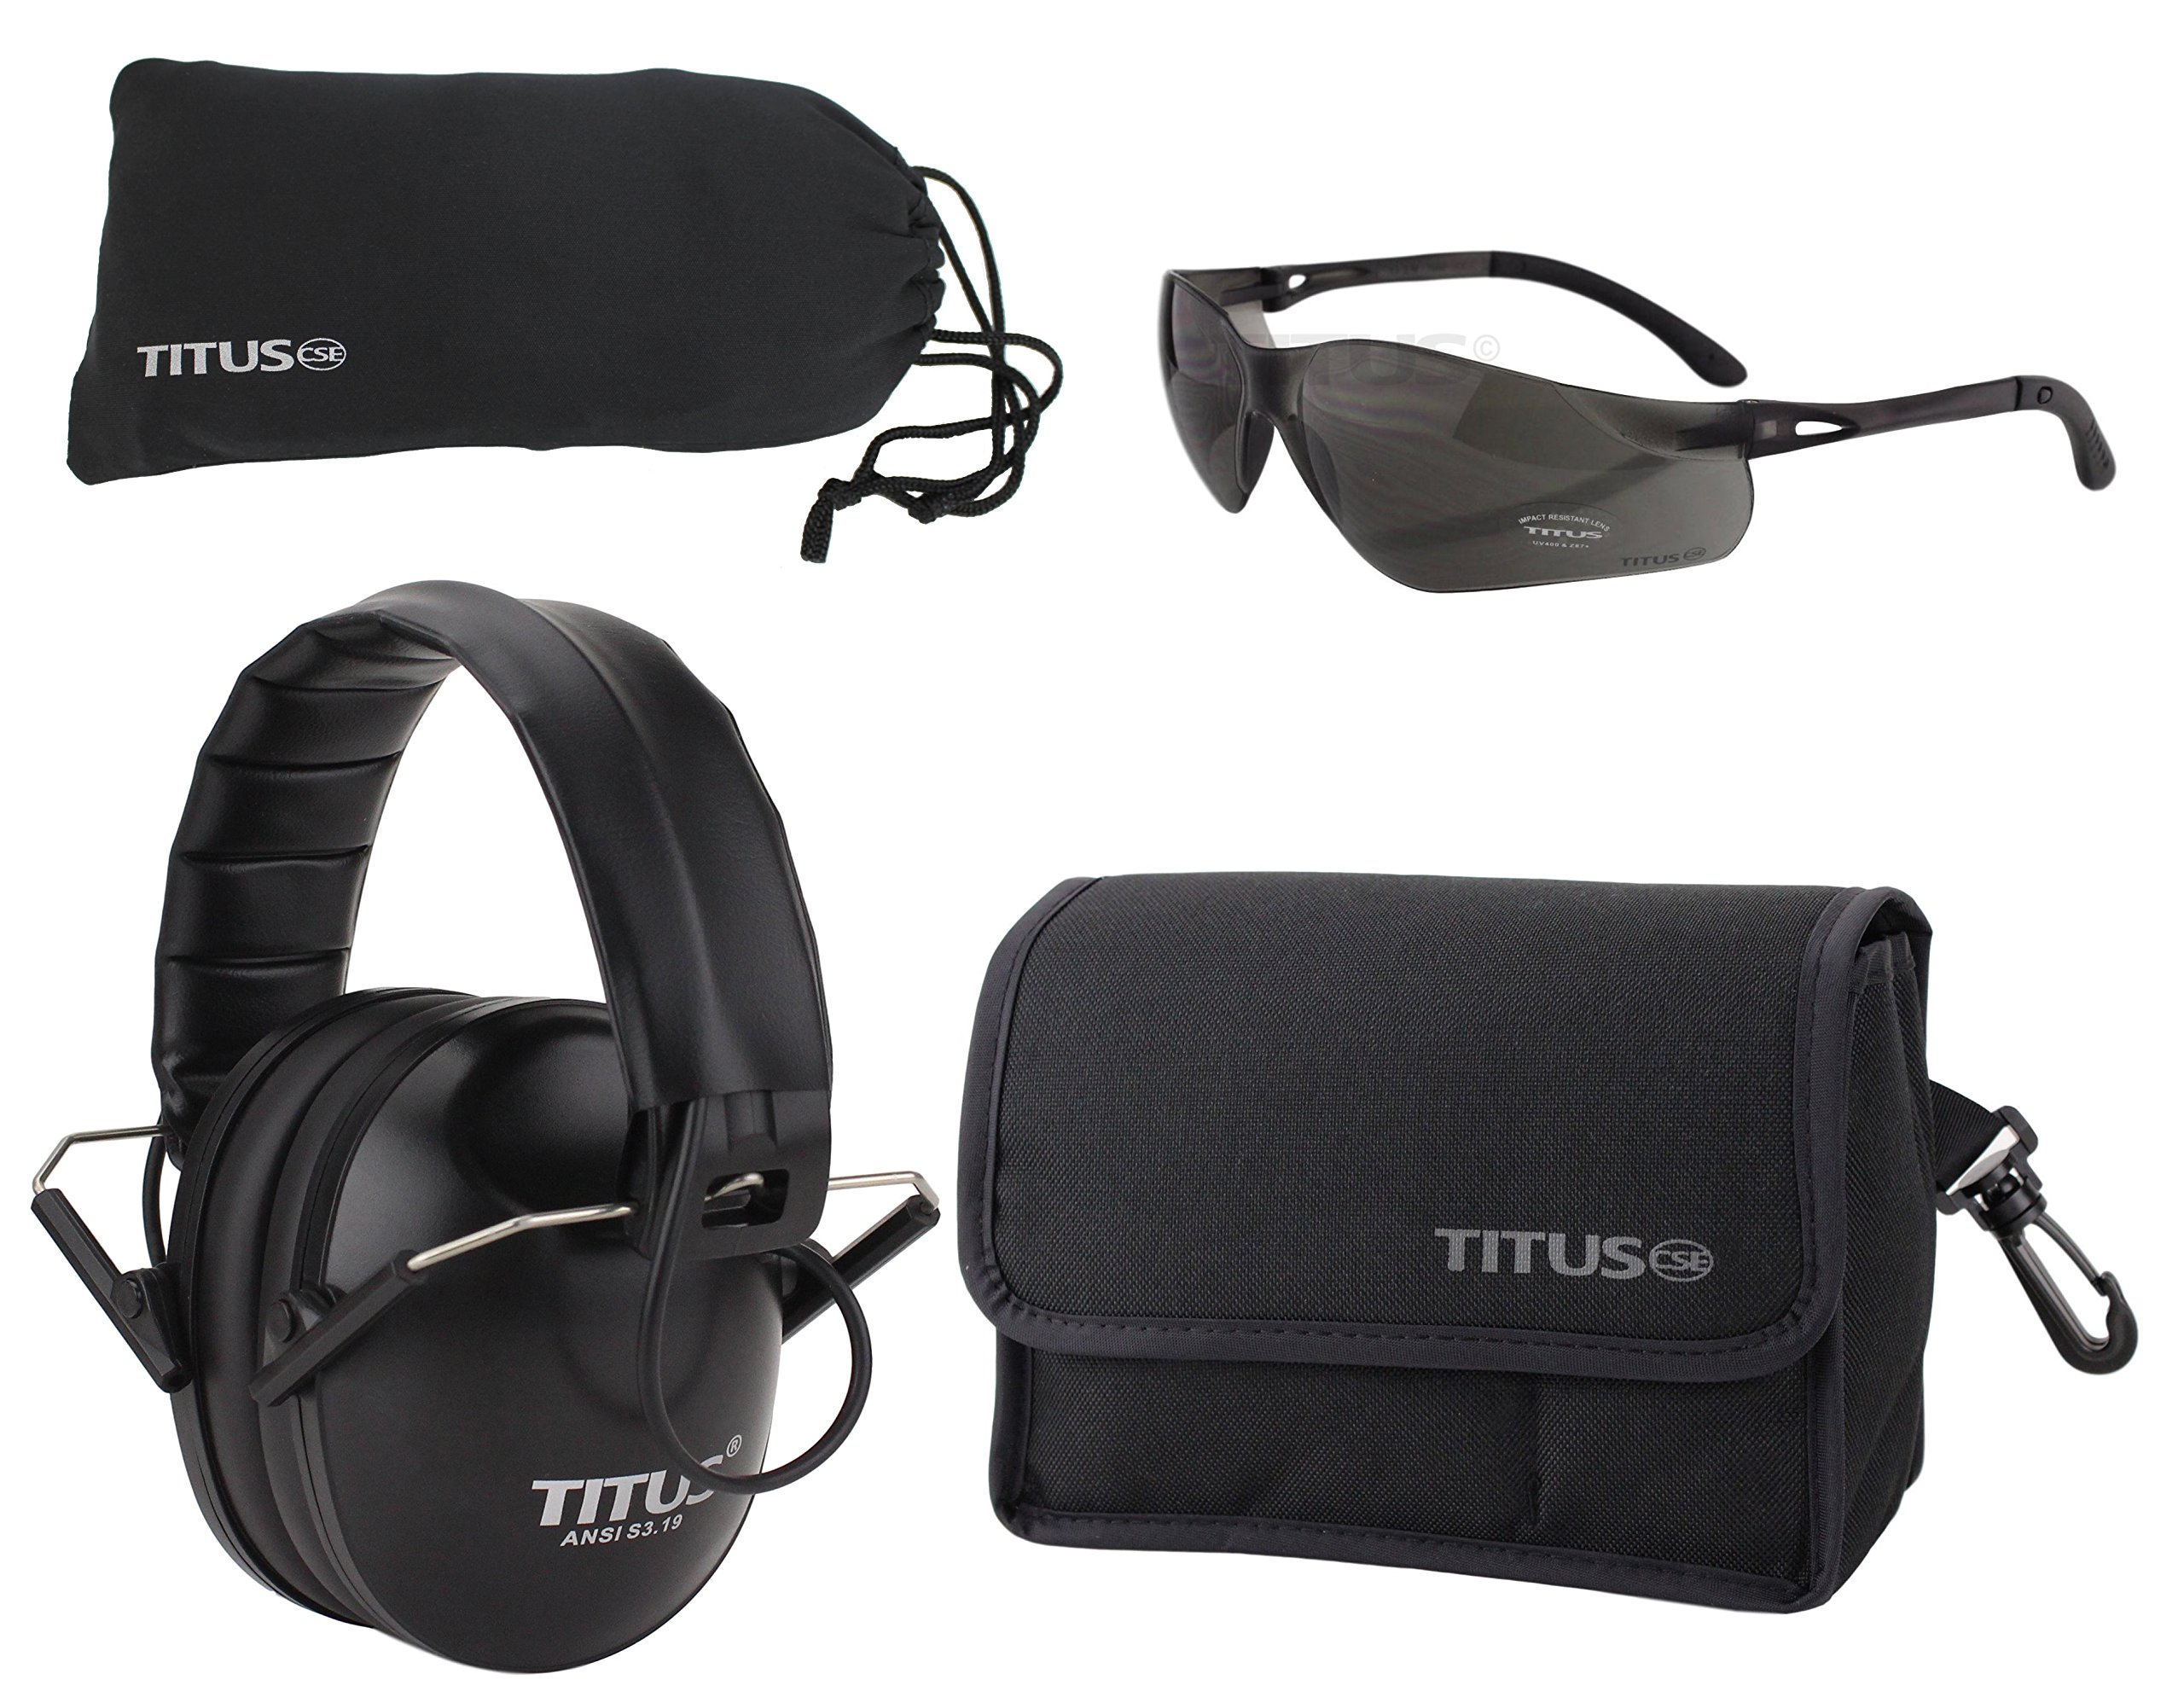 TITUS Top Combos: Safety Earmuffs & Glasses (Black Electronic - Slim, G3 Smoke Tint Z87+ High-Velocity)